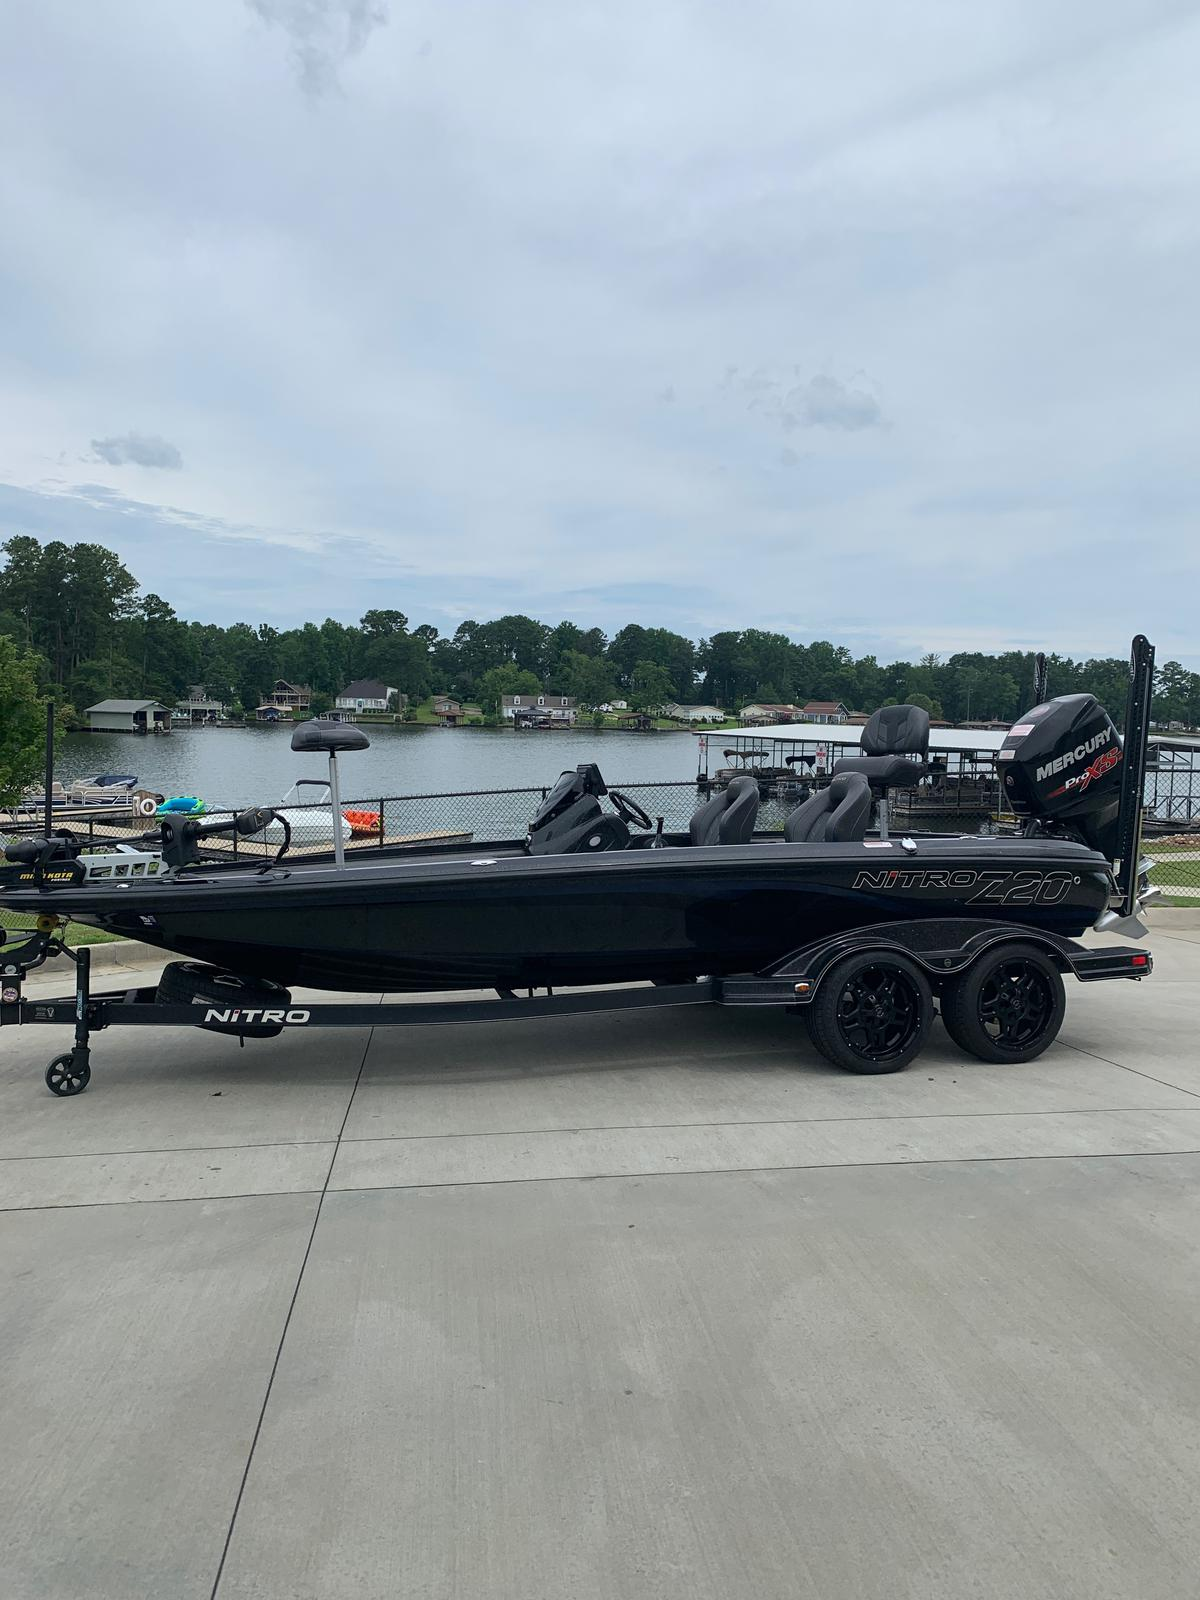 2018 Nitro boat for sale, model of the boat is Z20 & Image # 32 of 32